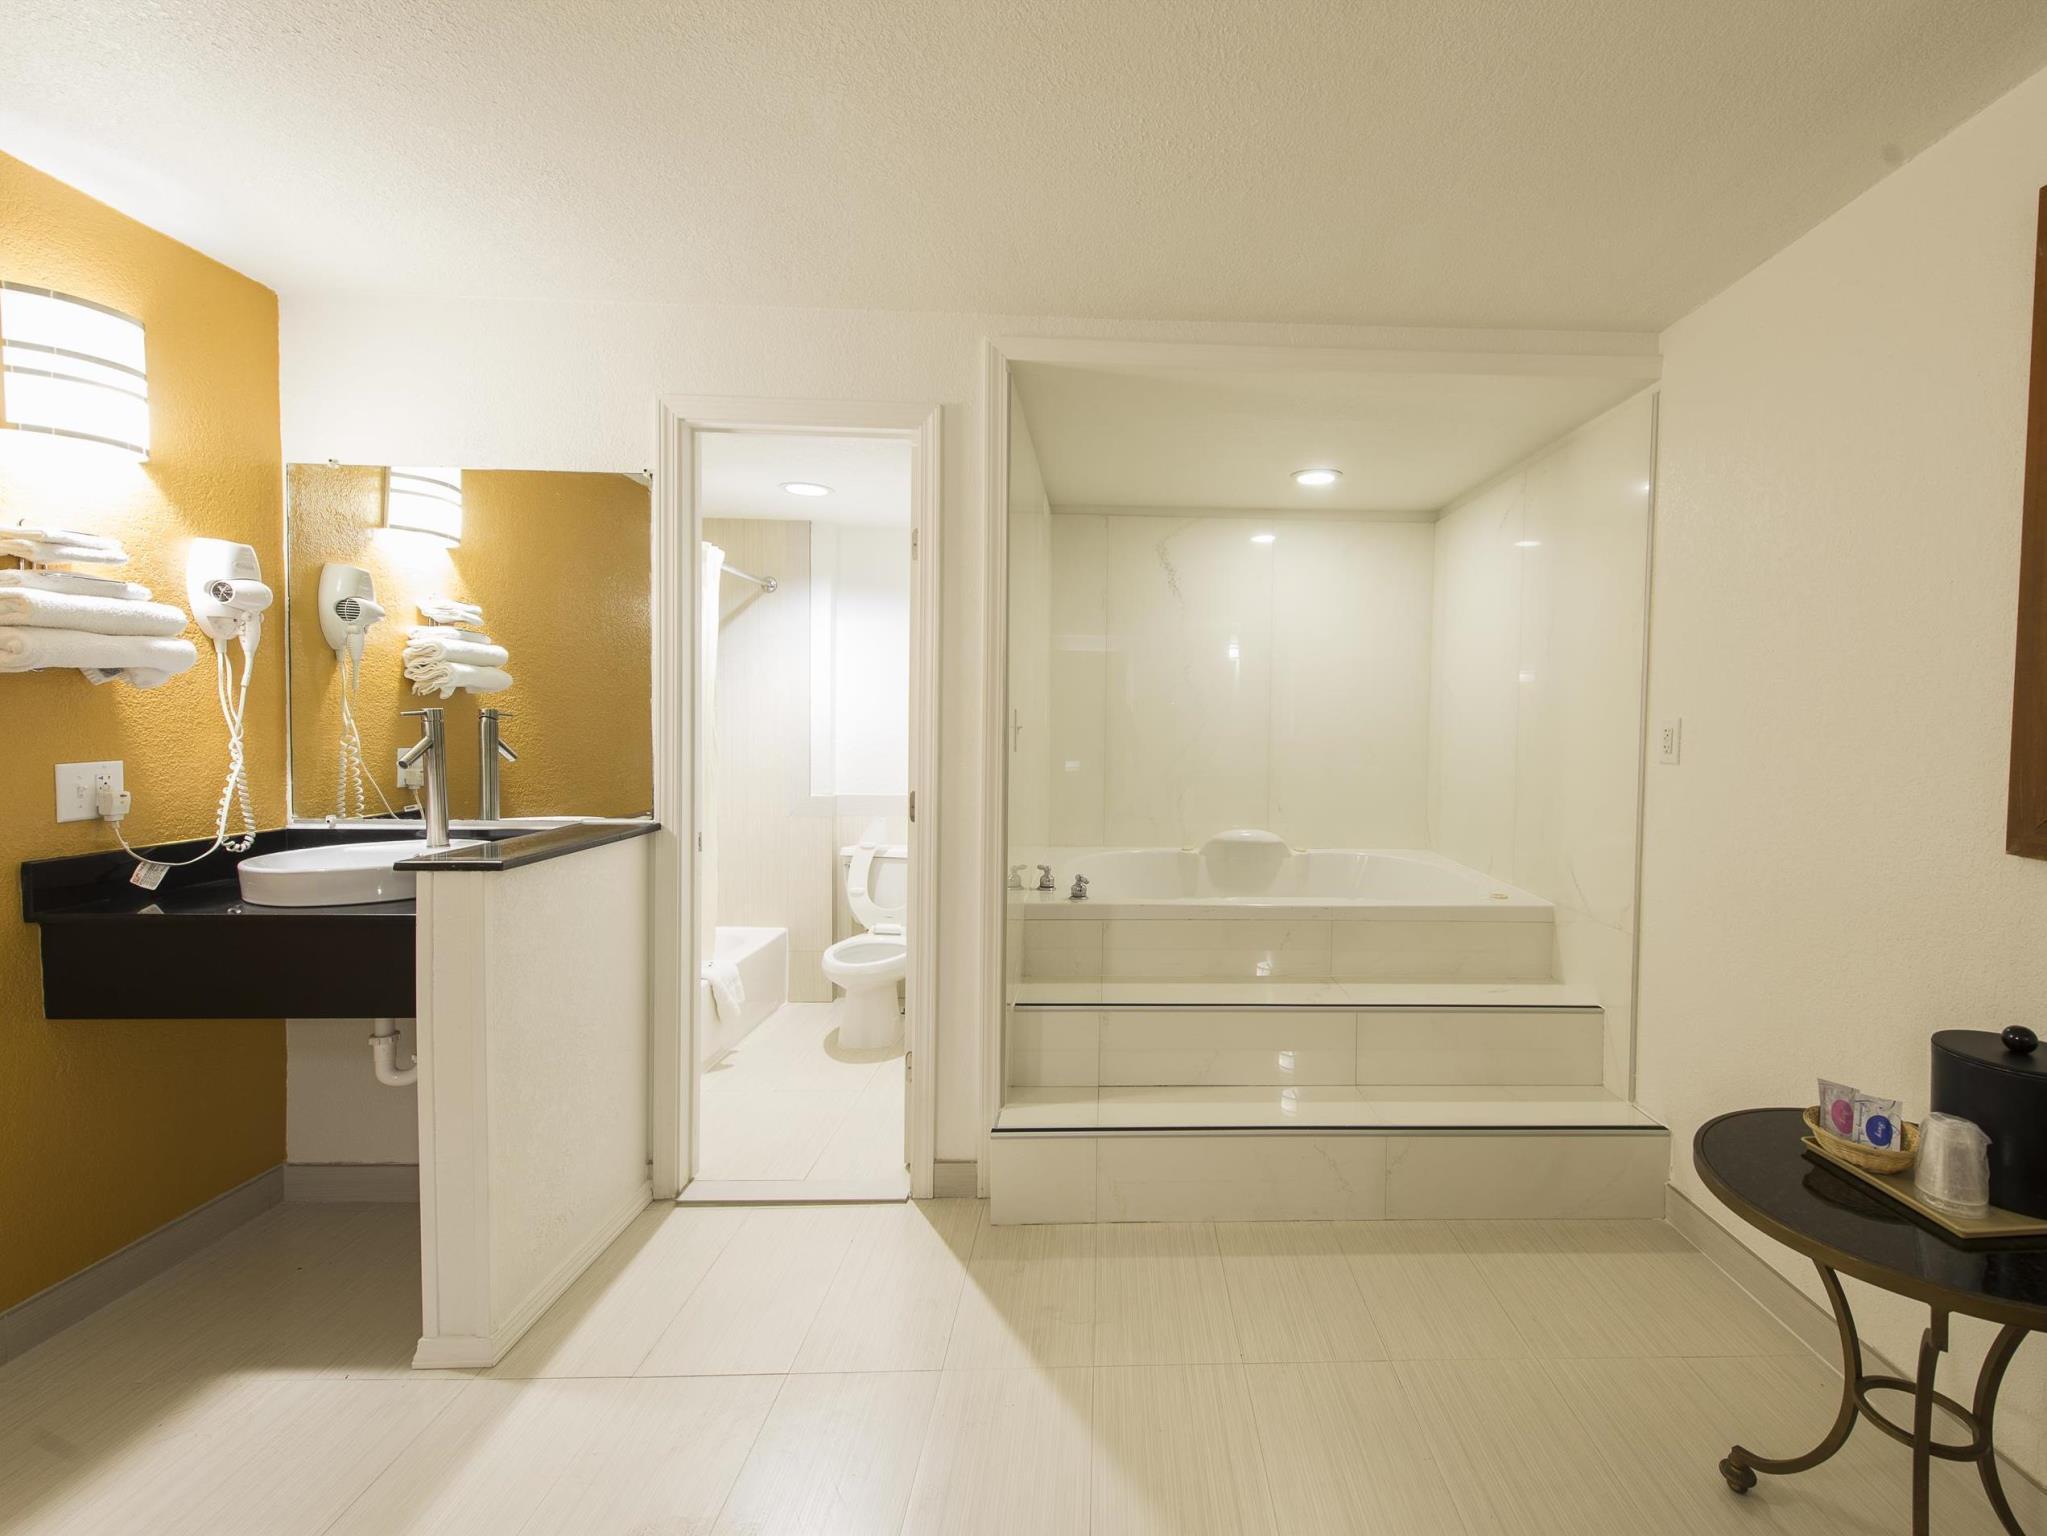 New Six Inn & Suites - Houston Reviews